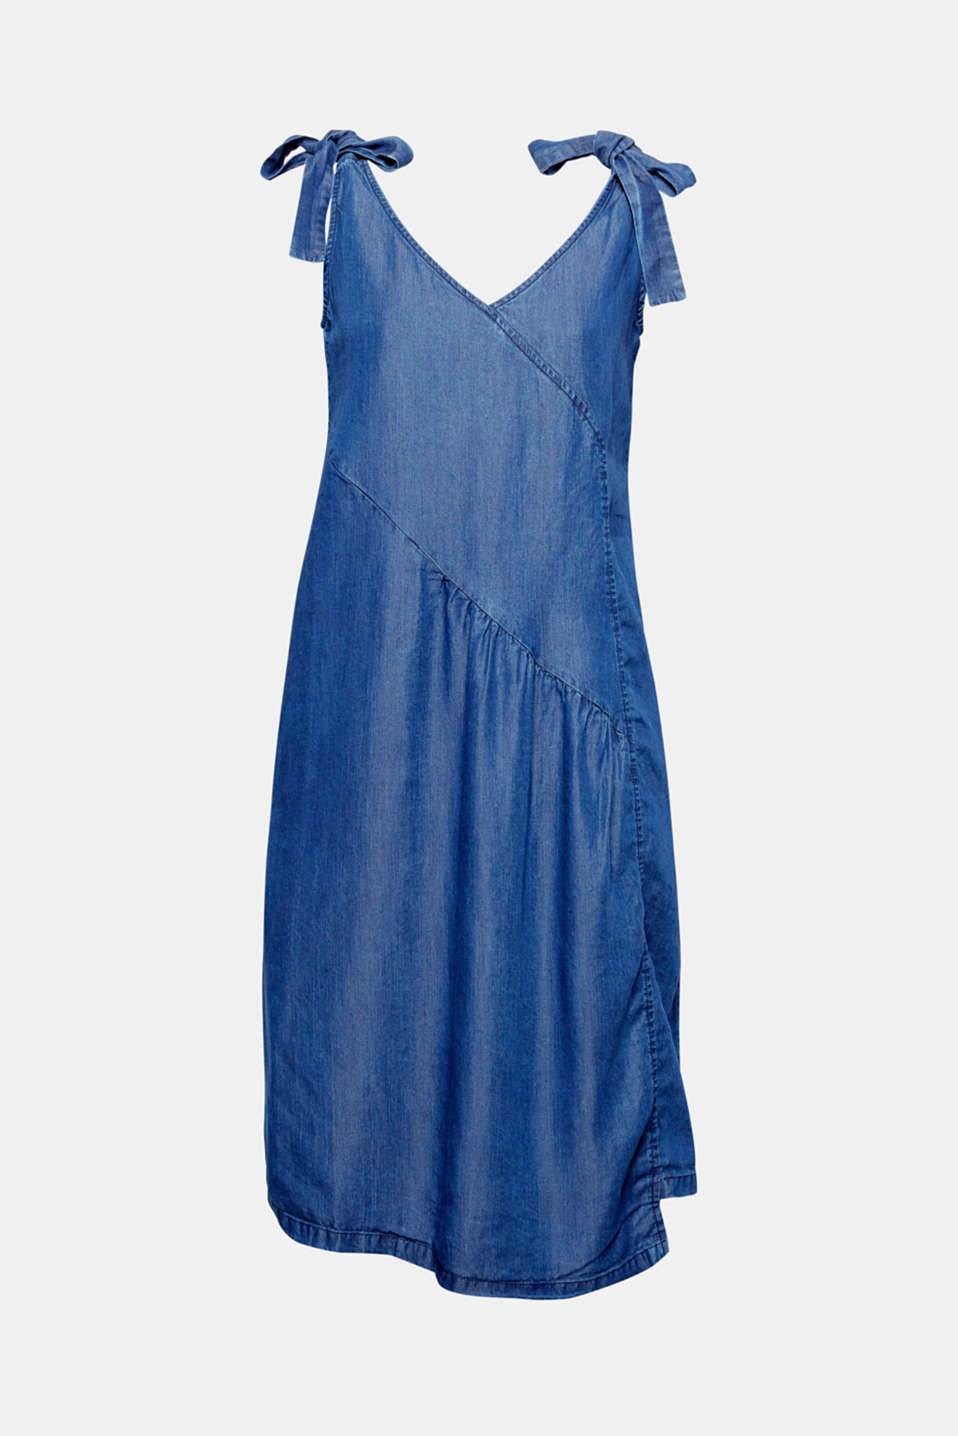 Esprit - Flowing denim-look lyocell dress at our Online Shop